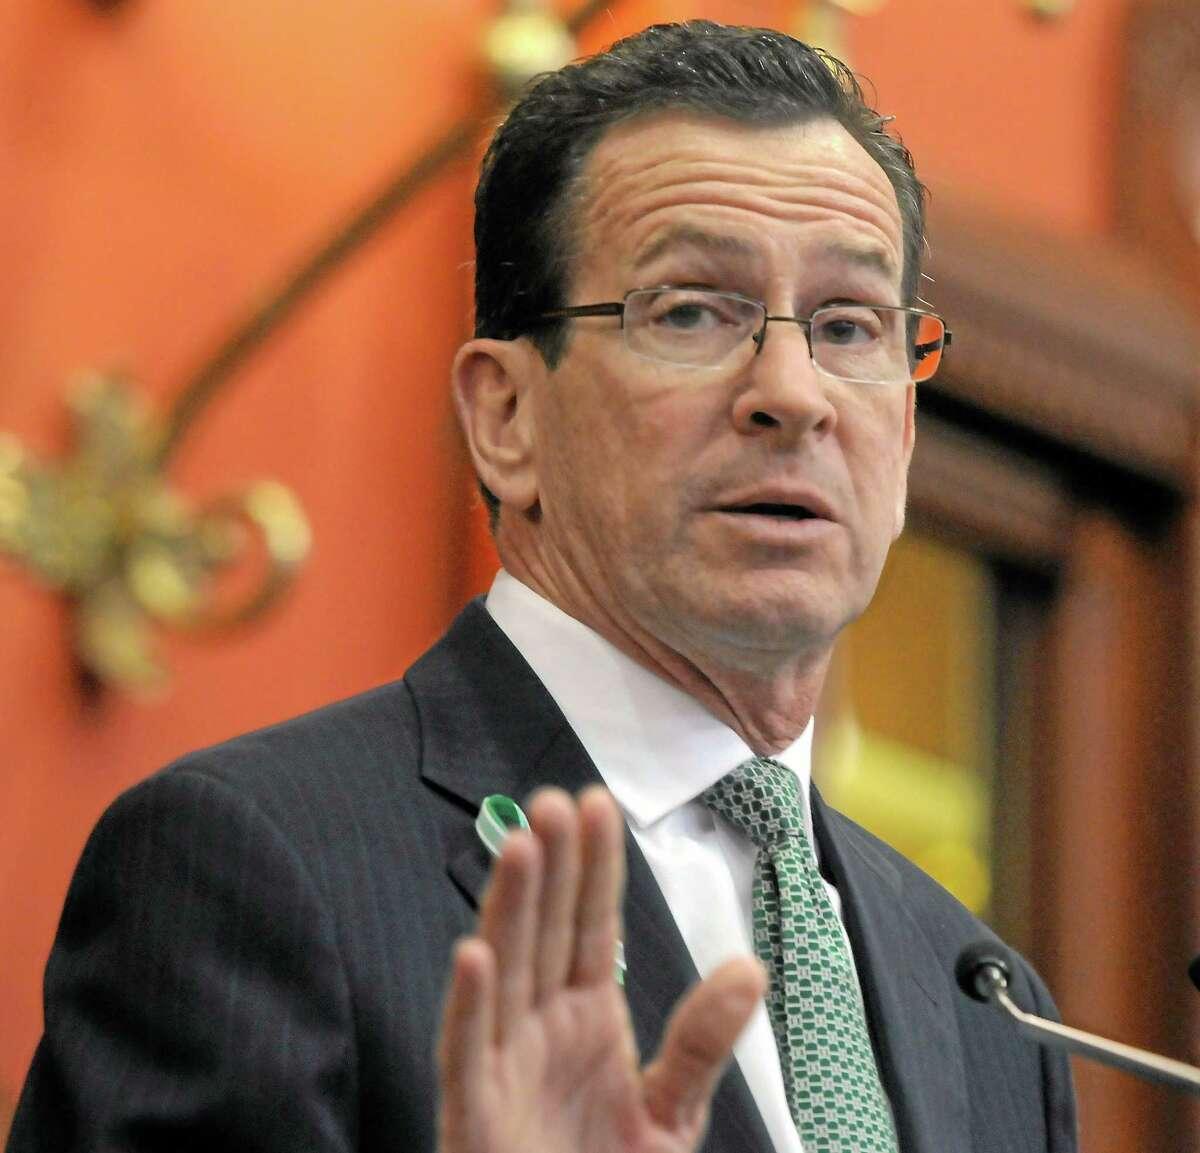 File photo: Gov. Dannel P. Malloy addresses the CT legislature in his biennial budget address.